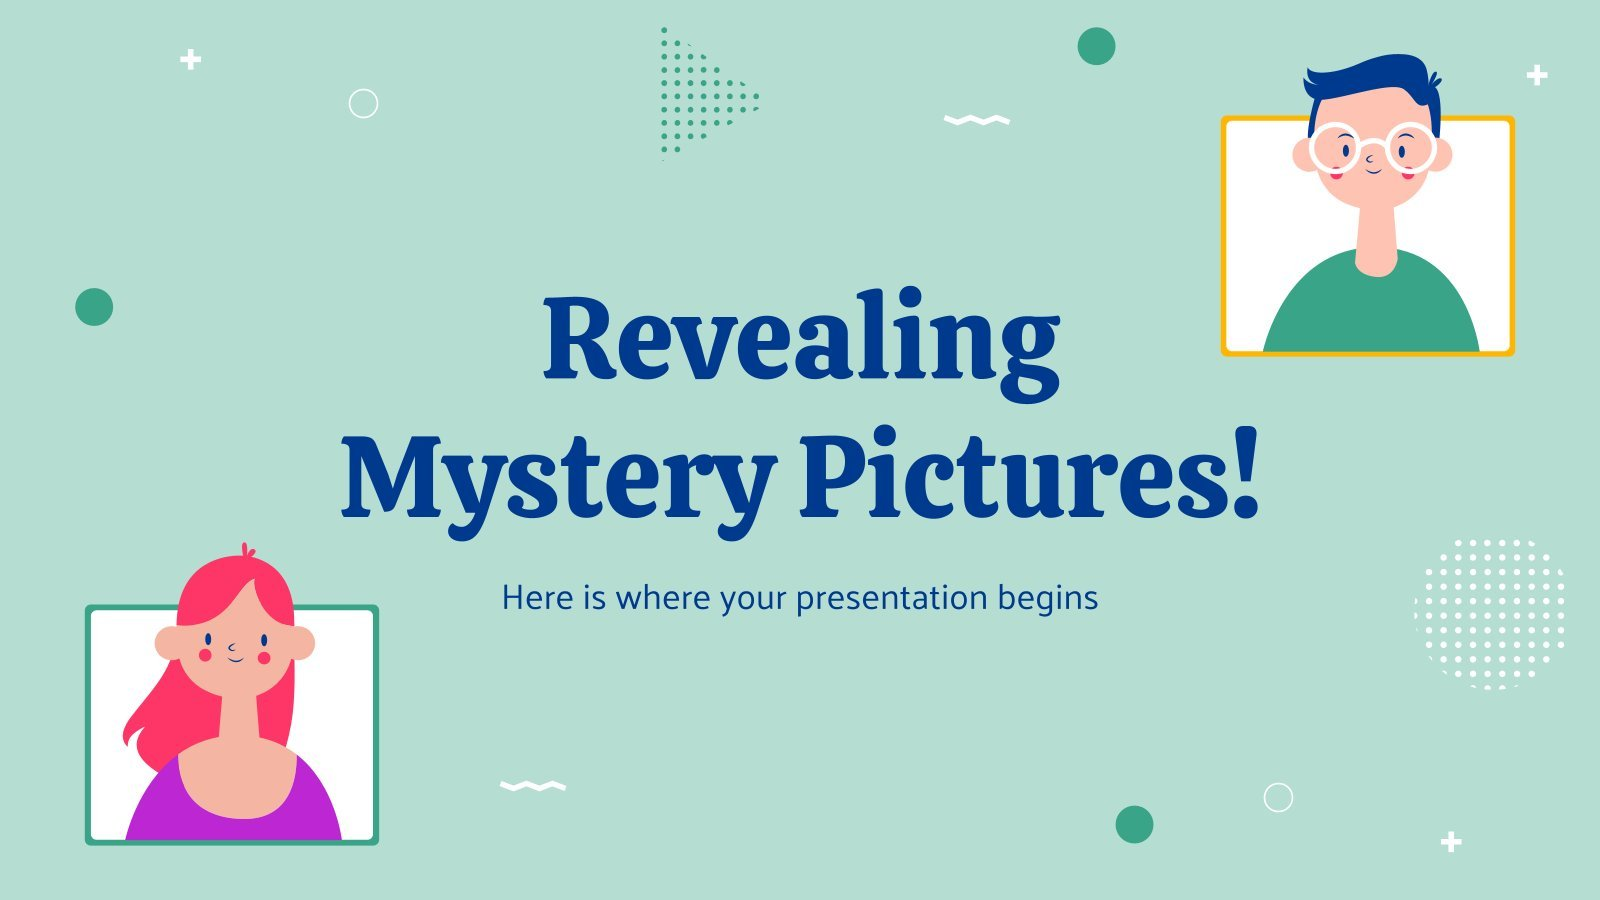 Plantilla de presentación ¡Revelación de fotos misteriosas!